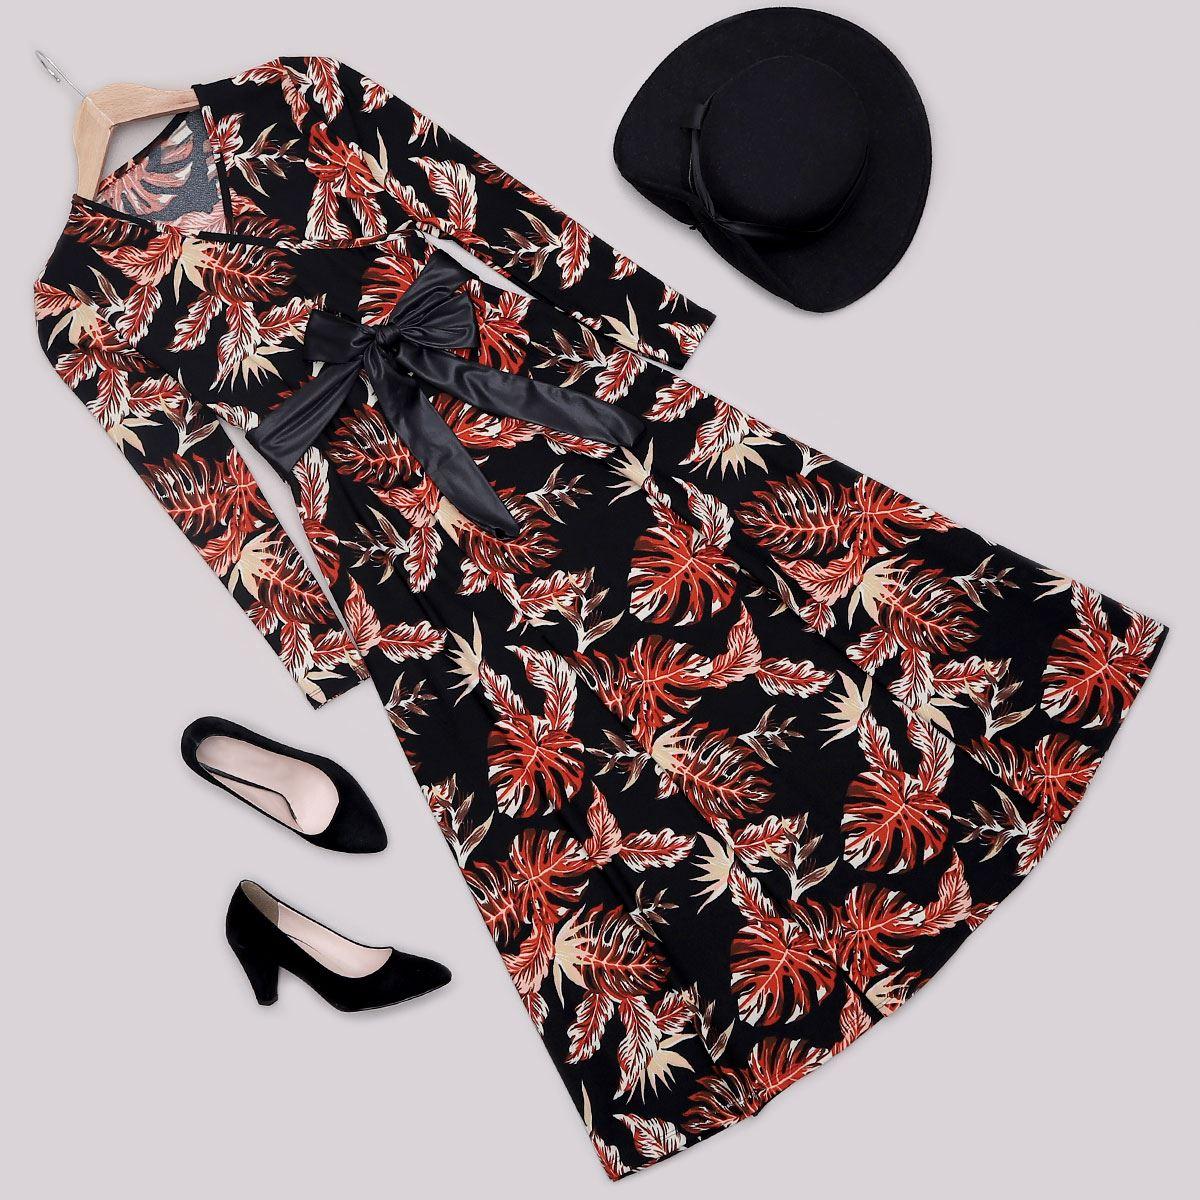 Siyah Yaprak Desenli Elbise ELB431